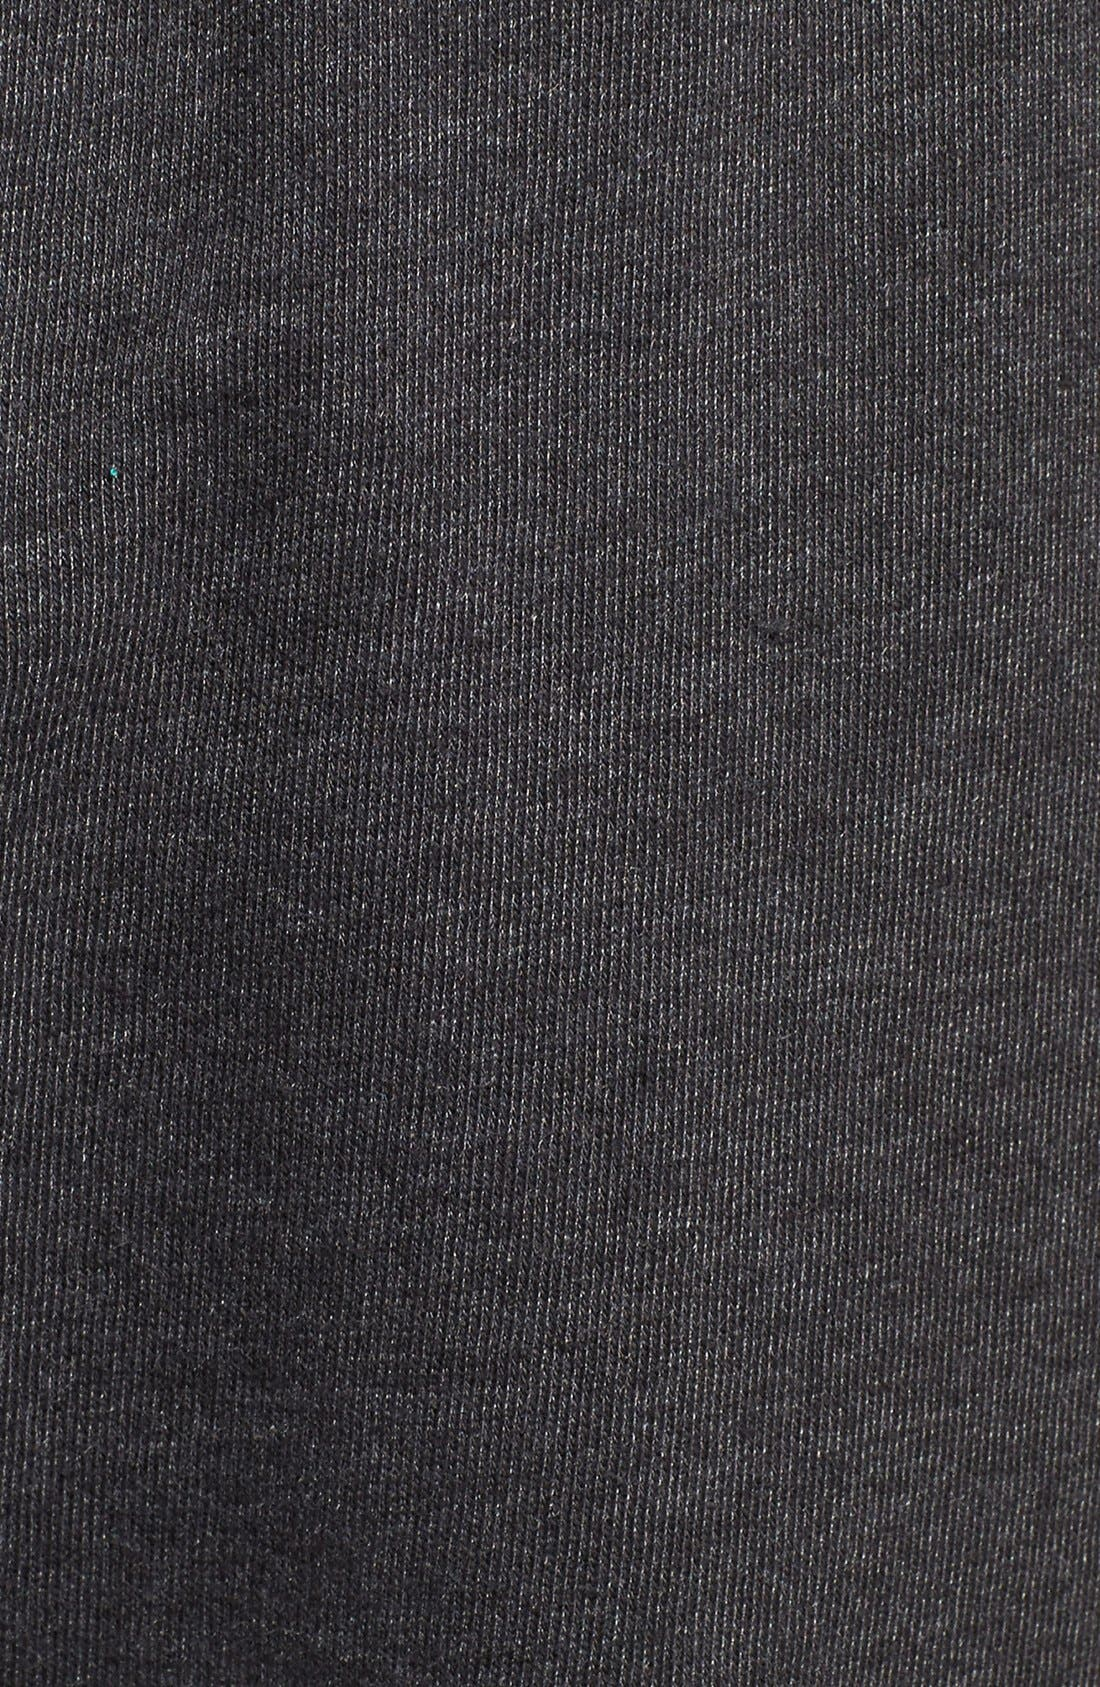 Cutoff Sweatpants,                             Alternate thumbnail 5, color,                             005